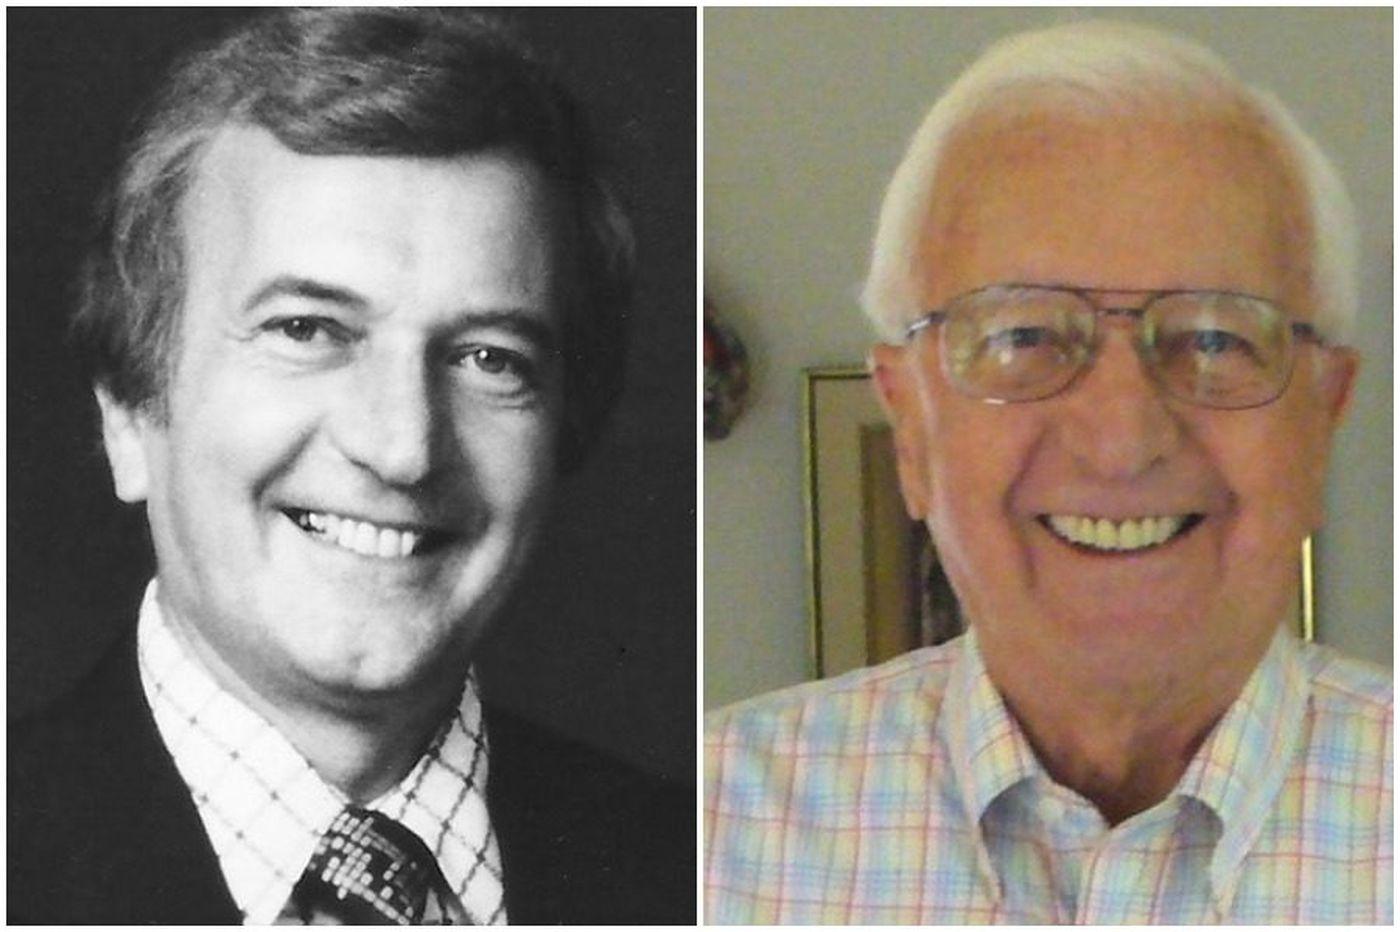 Vince Leonard, 92, former Channel 3 news anchor